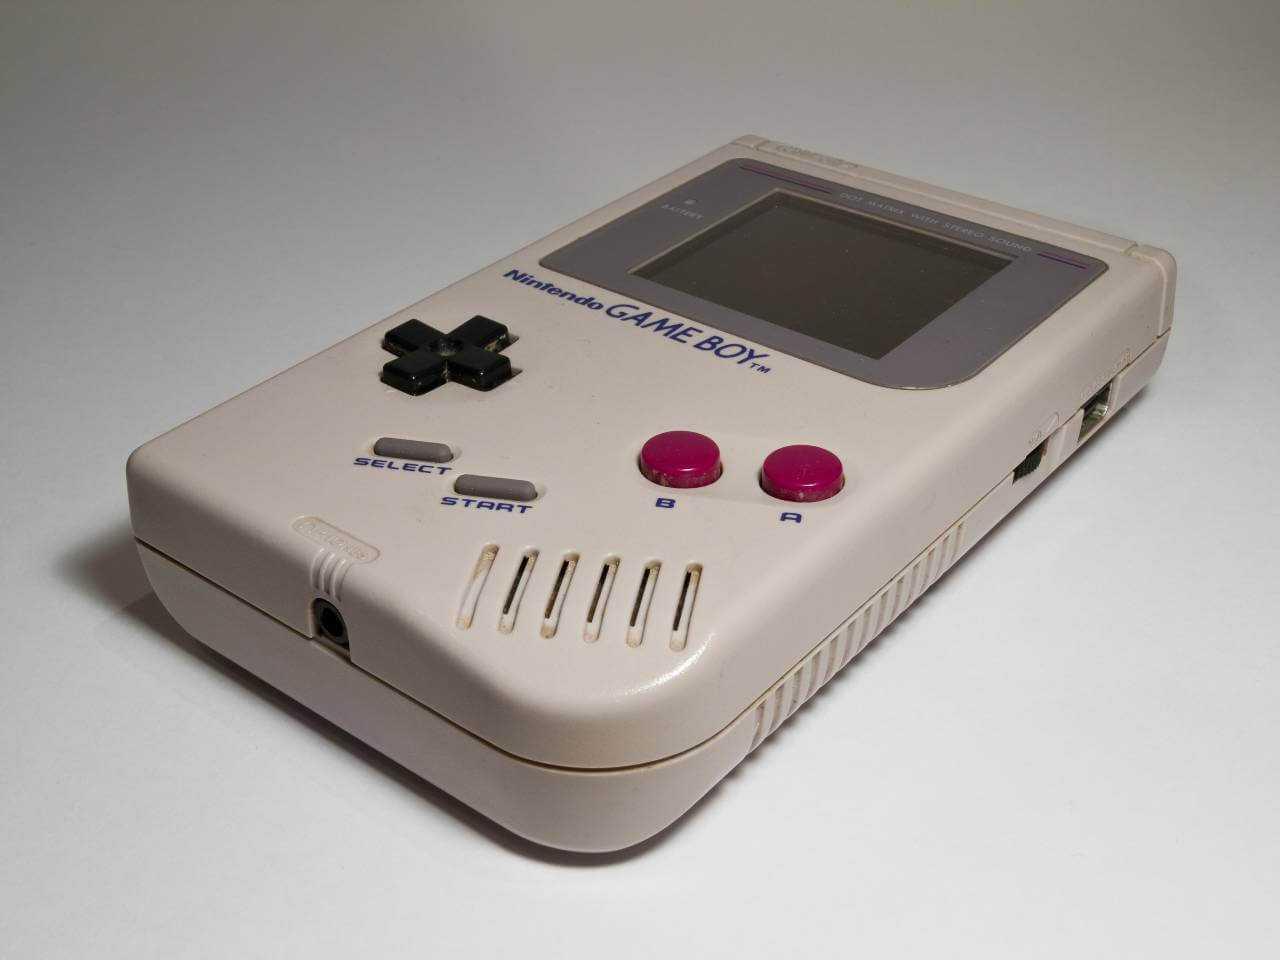 Gameboy compie 30 anni: boom ricerche